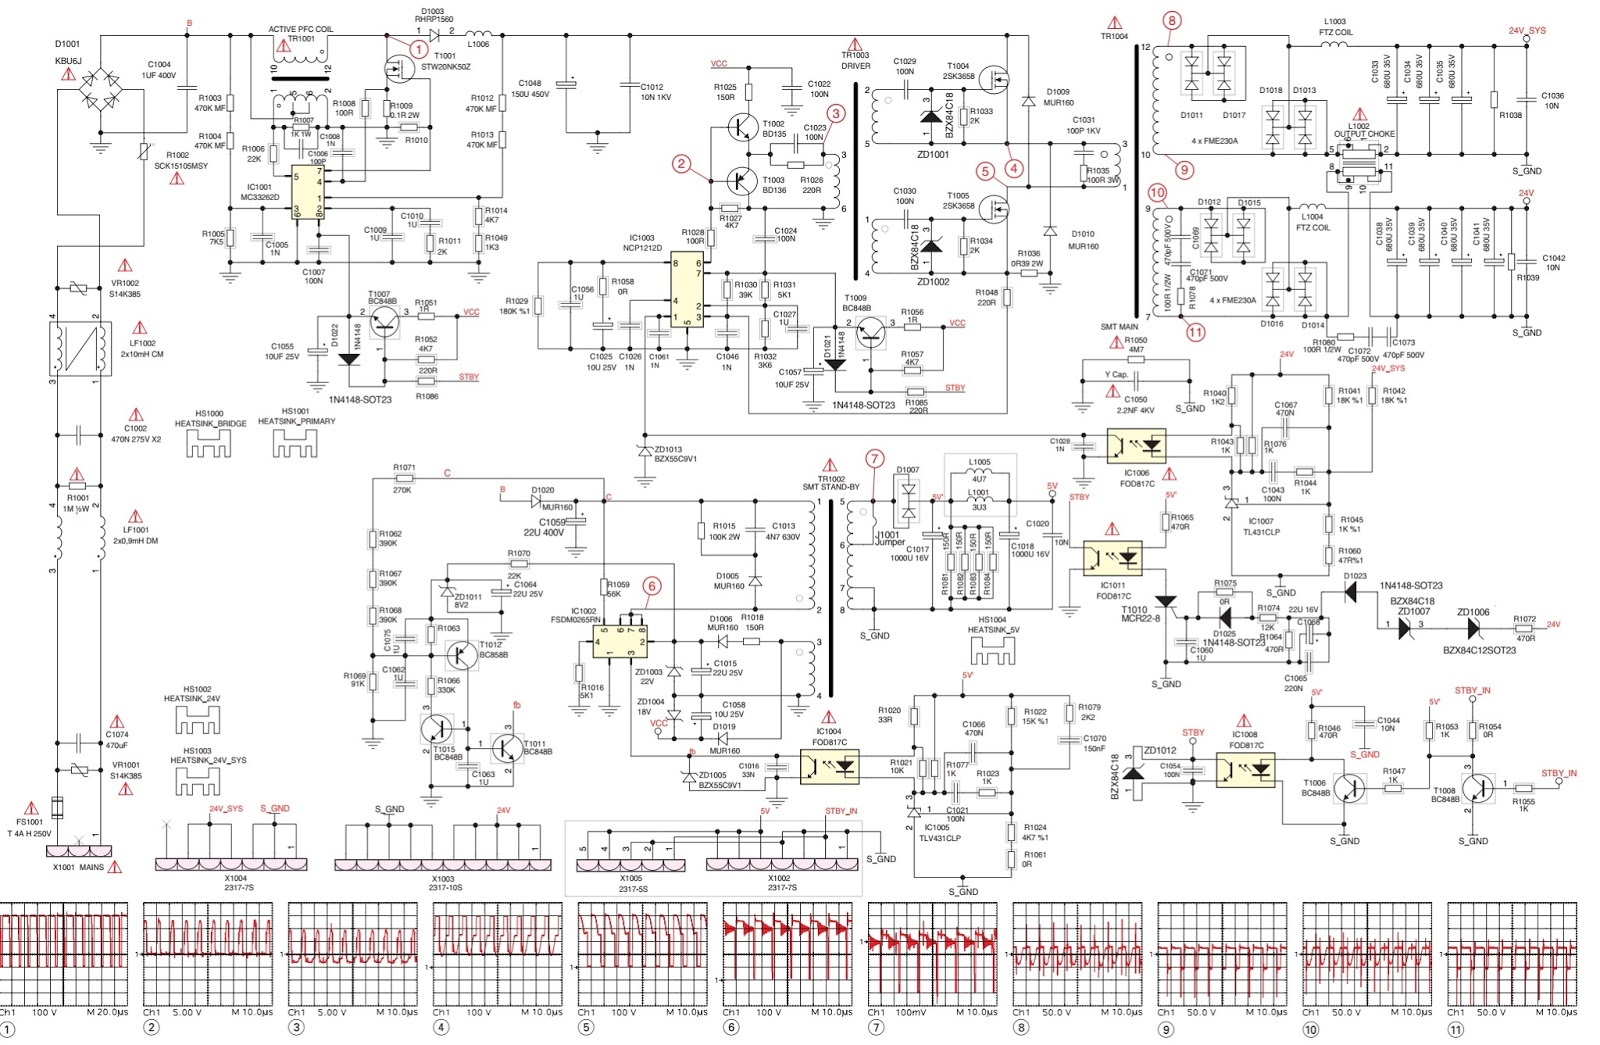 Grundig Lcd Tv Smps Schematics Circuit Diagrams Homenol Dryer Schematic Wiring Diagram Fuse Screw Power Supply Board Zz7194 11 Mc33262d Ncp1212d Fsdm0265rn Fod817copto